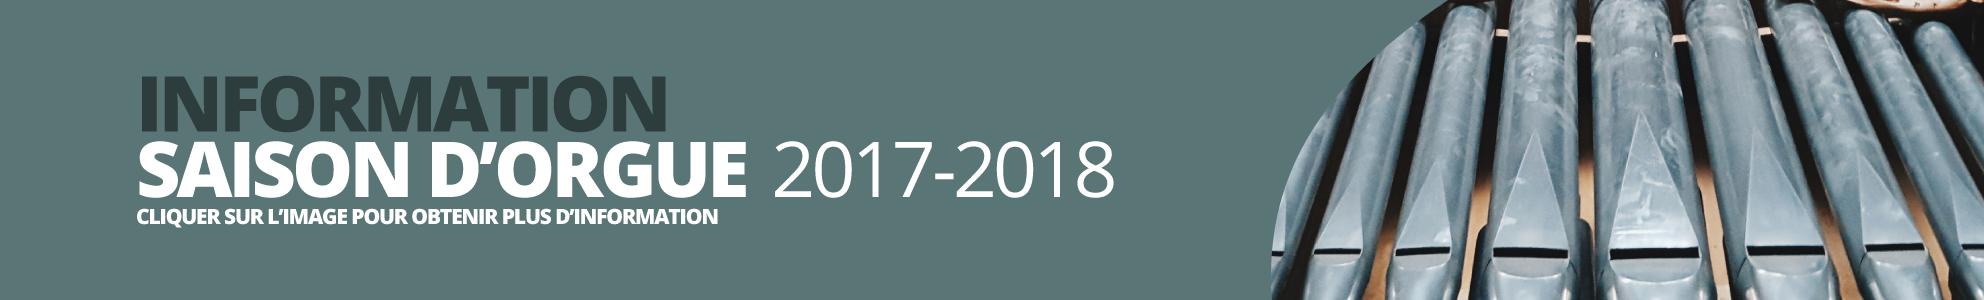 information-saison-amis-cathedrale-frejus-site-web